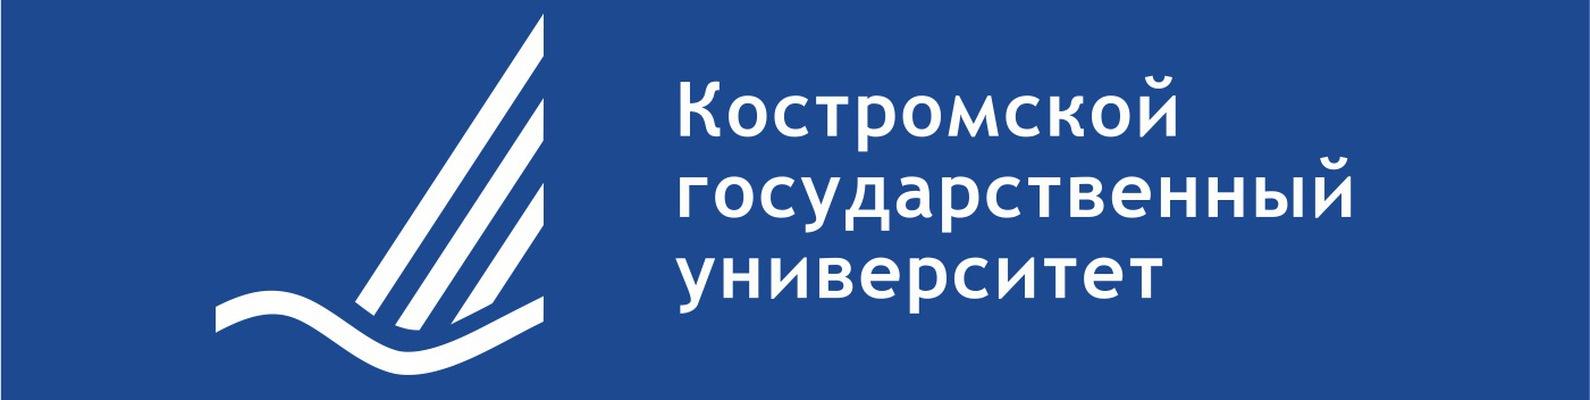 Кгу номер телефона бухгалтерии форма декларации 3 ндфл за 2008 год